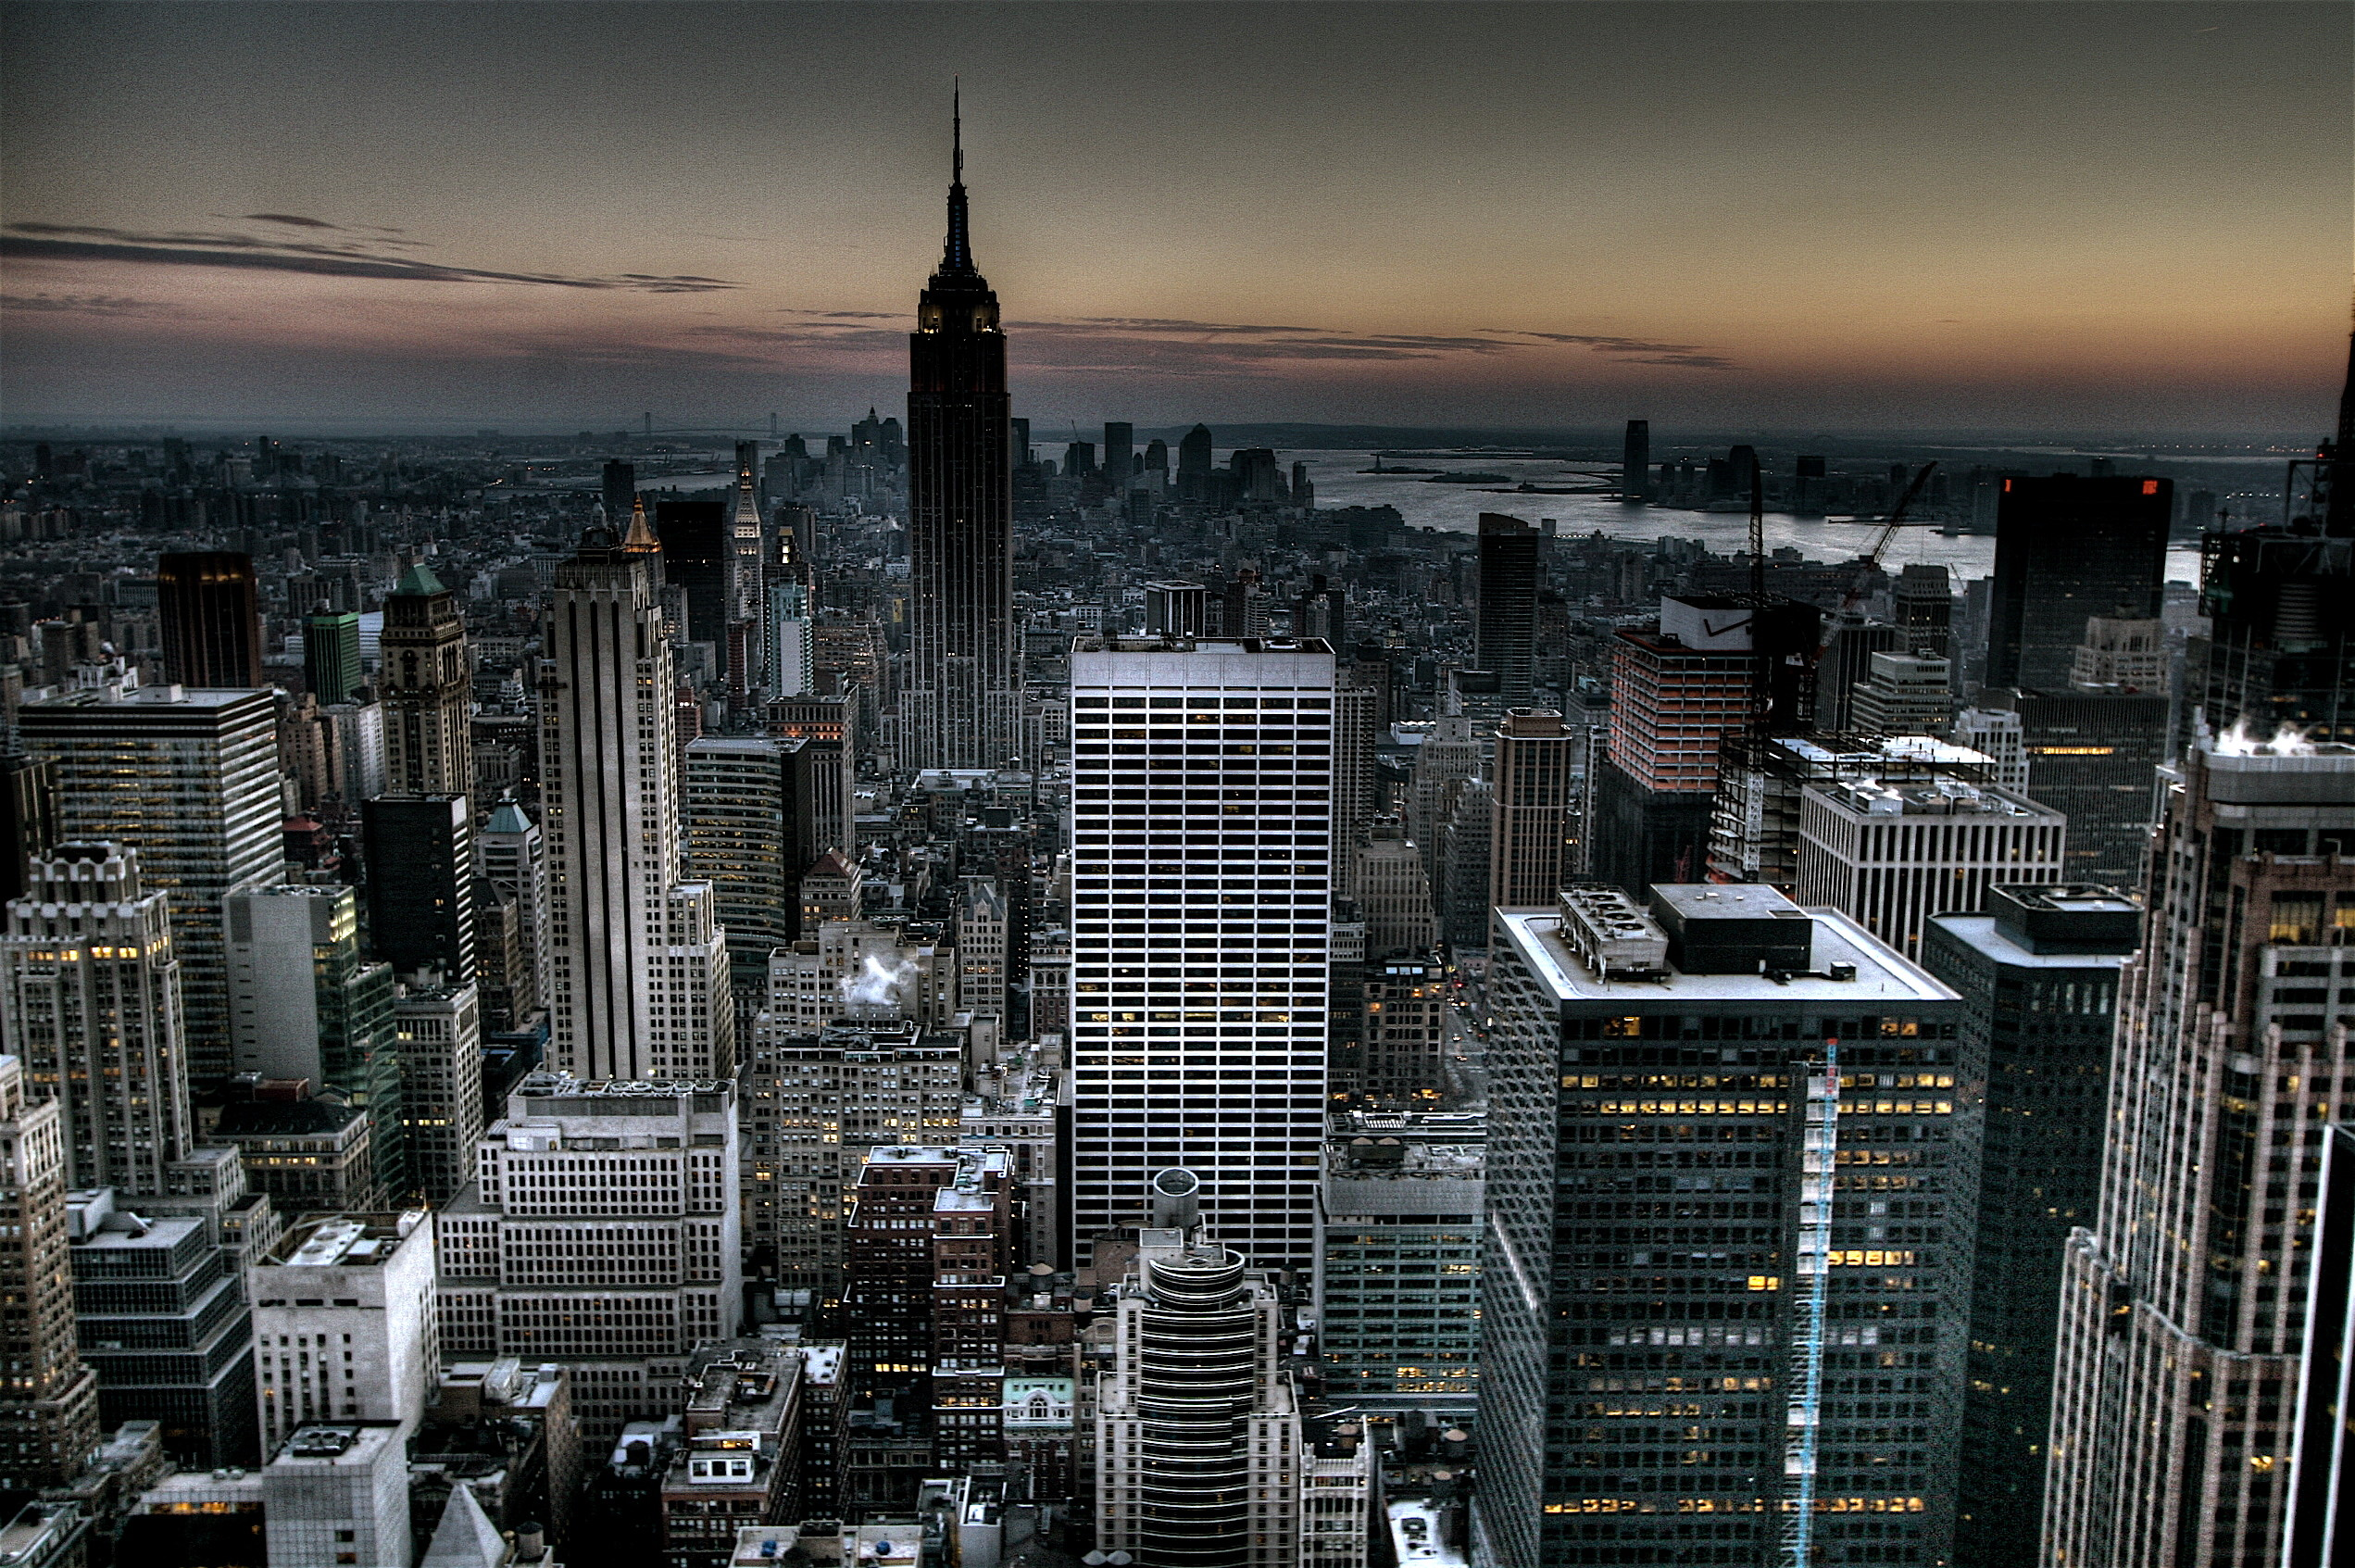 New York City Wallpaper HD ·â'